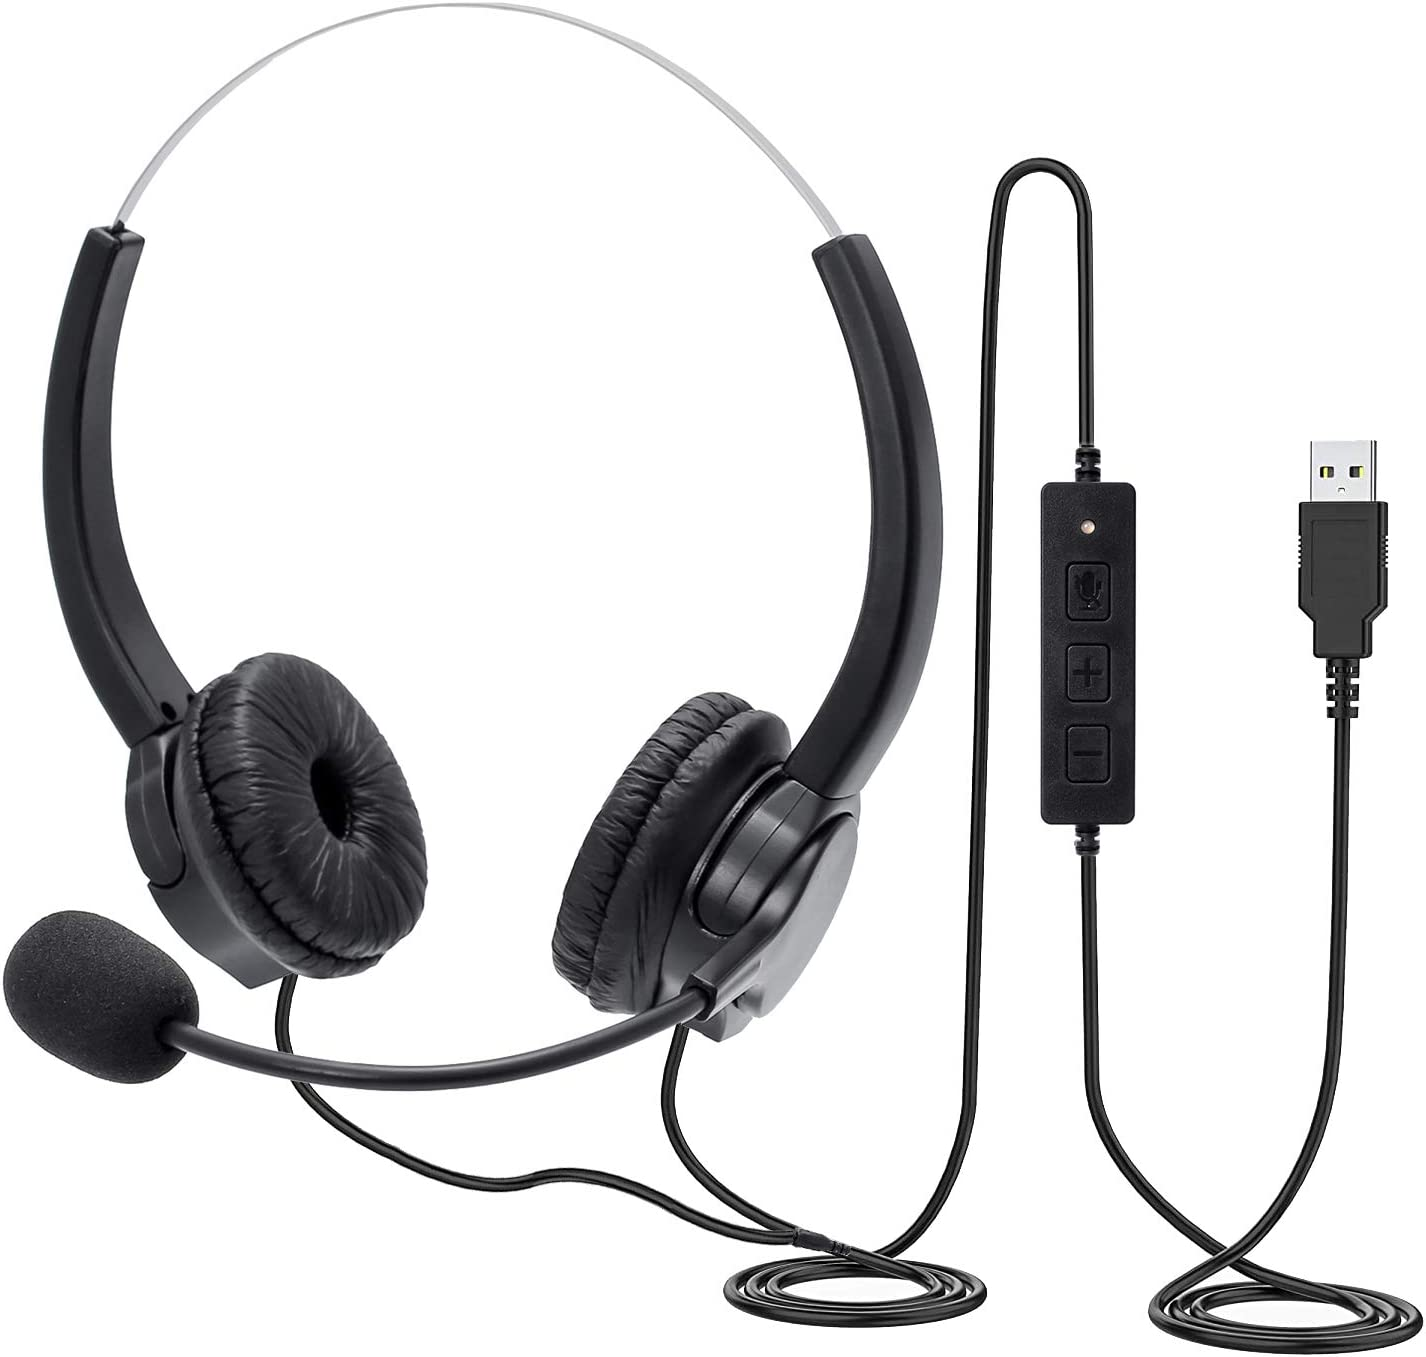 Usb Headset Pc Headset Mit Mikrofon Noise Cancelling Elektronik